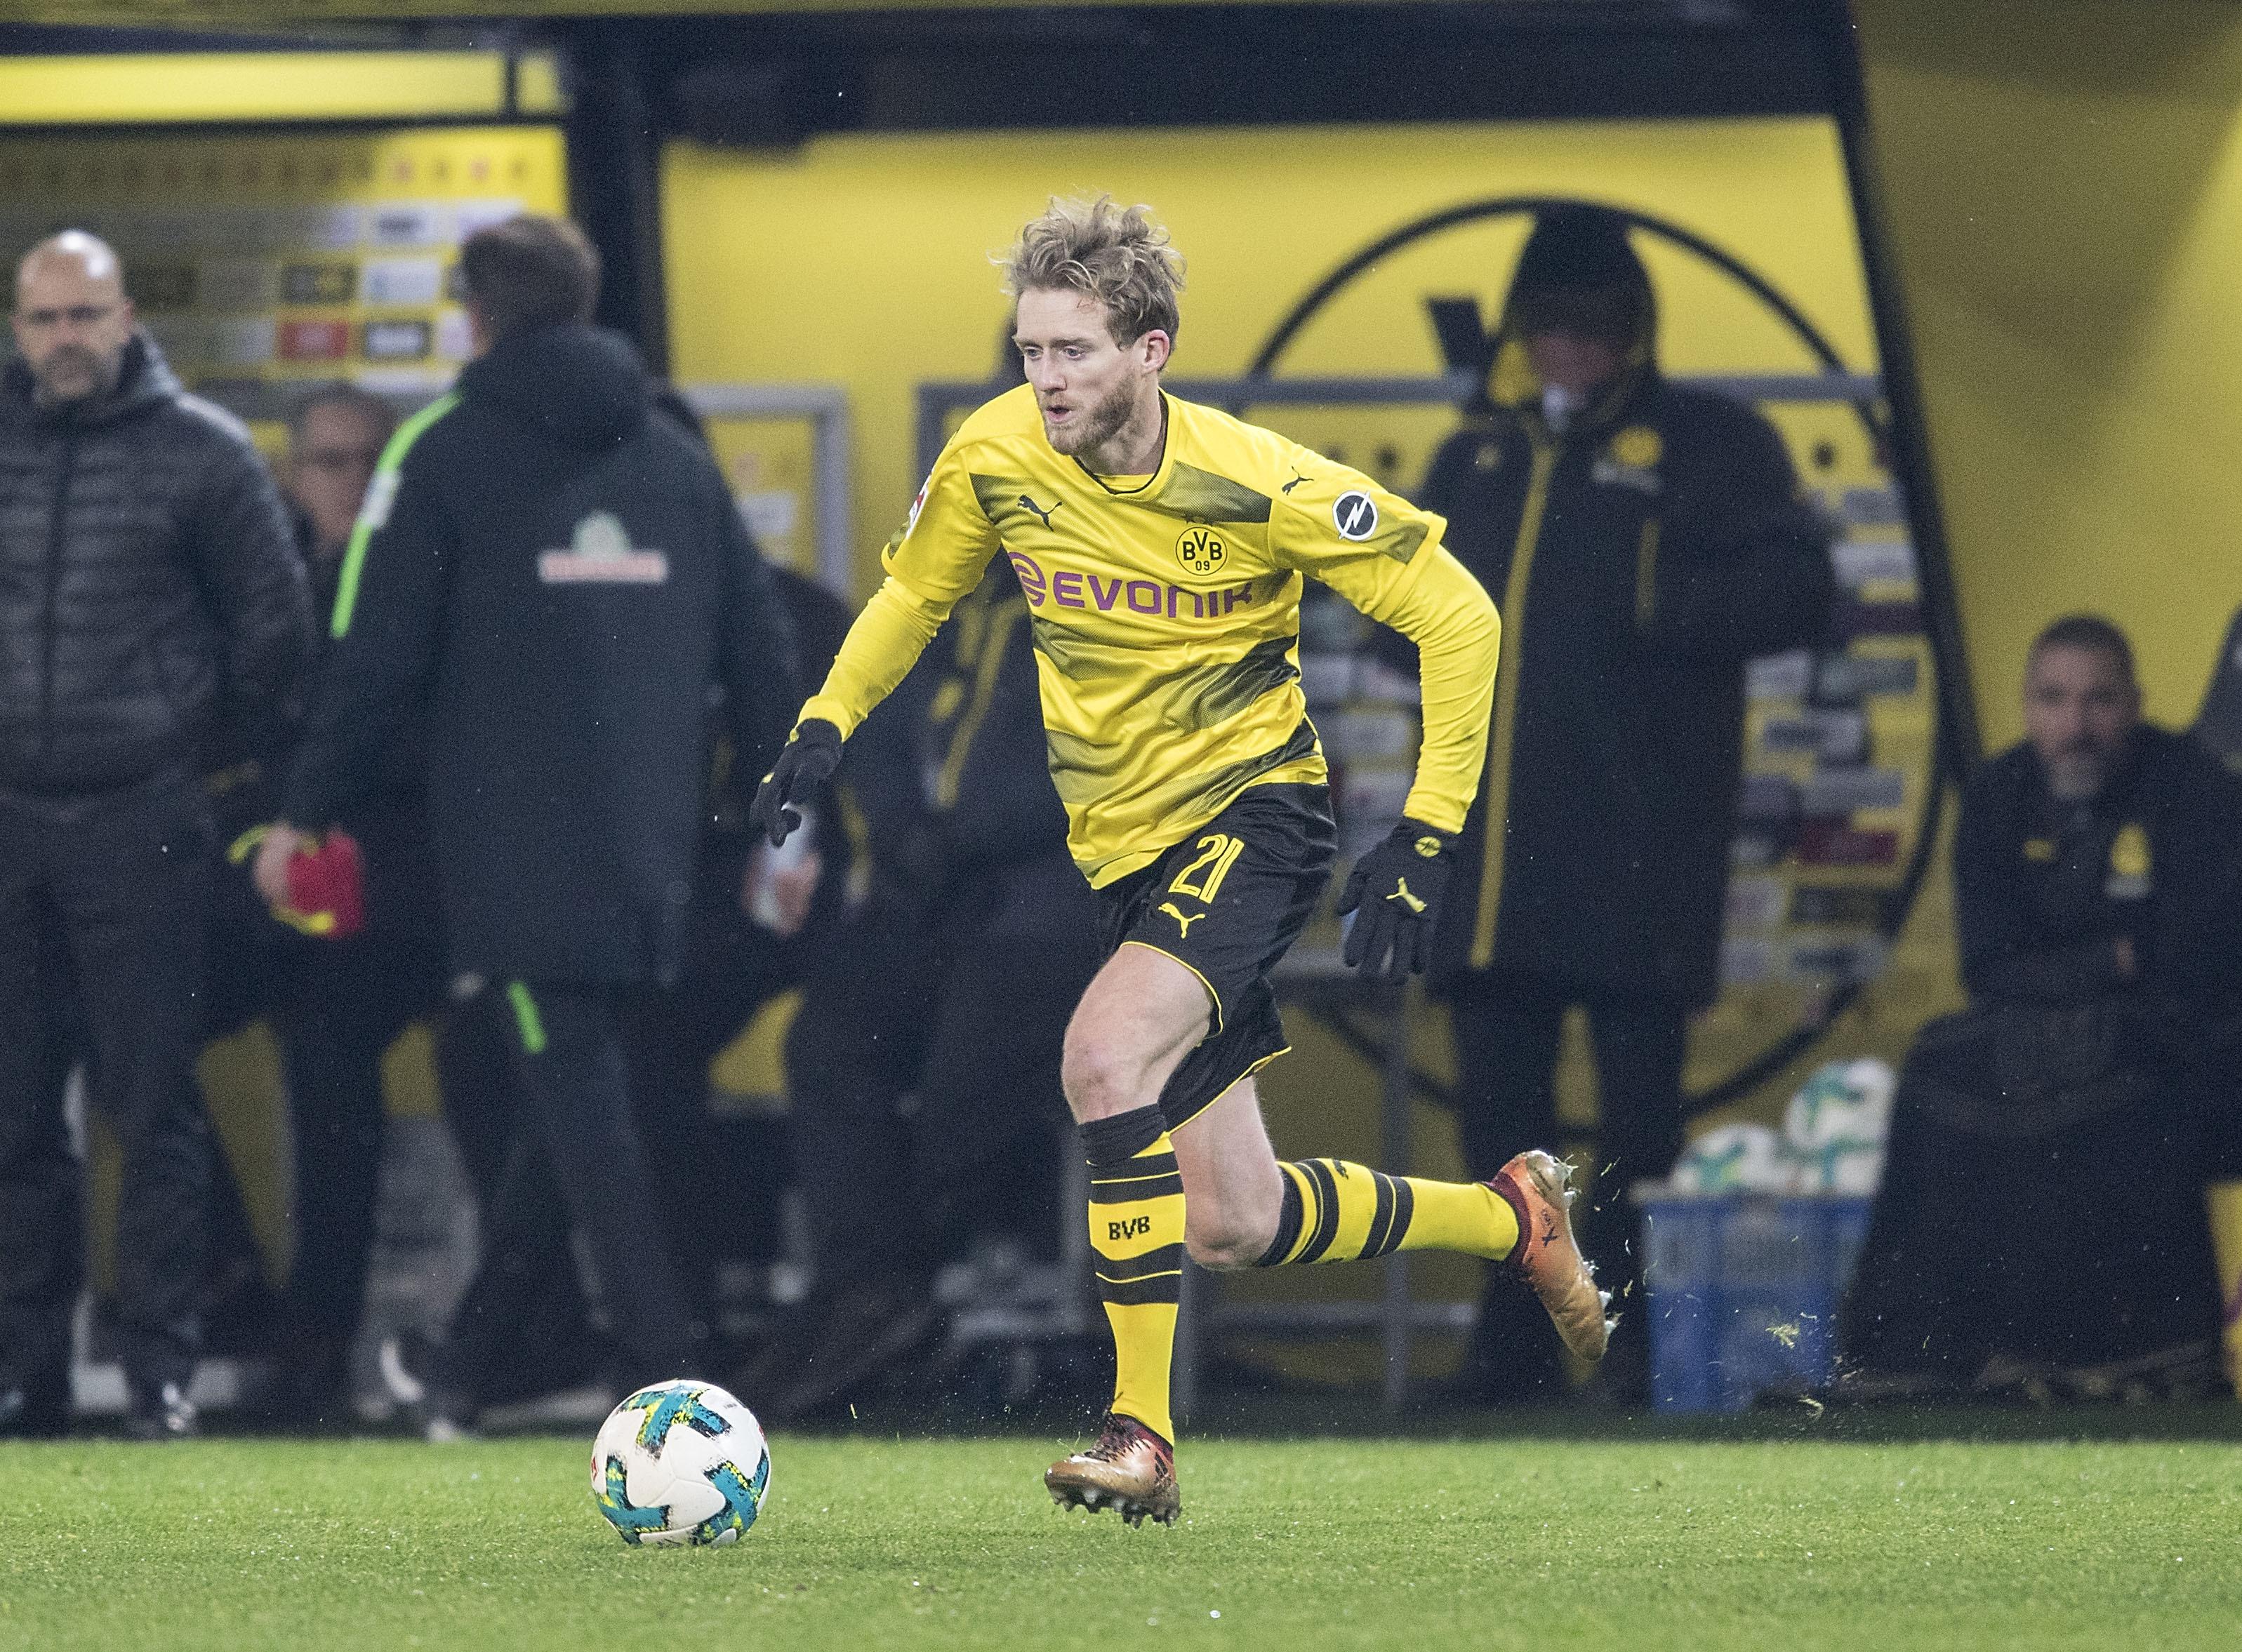 Dortmund's Schurrle. Image: PA